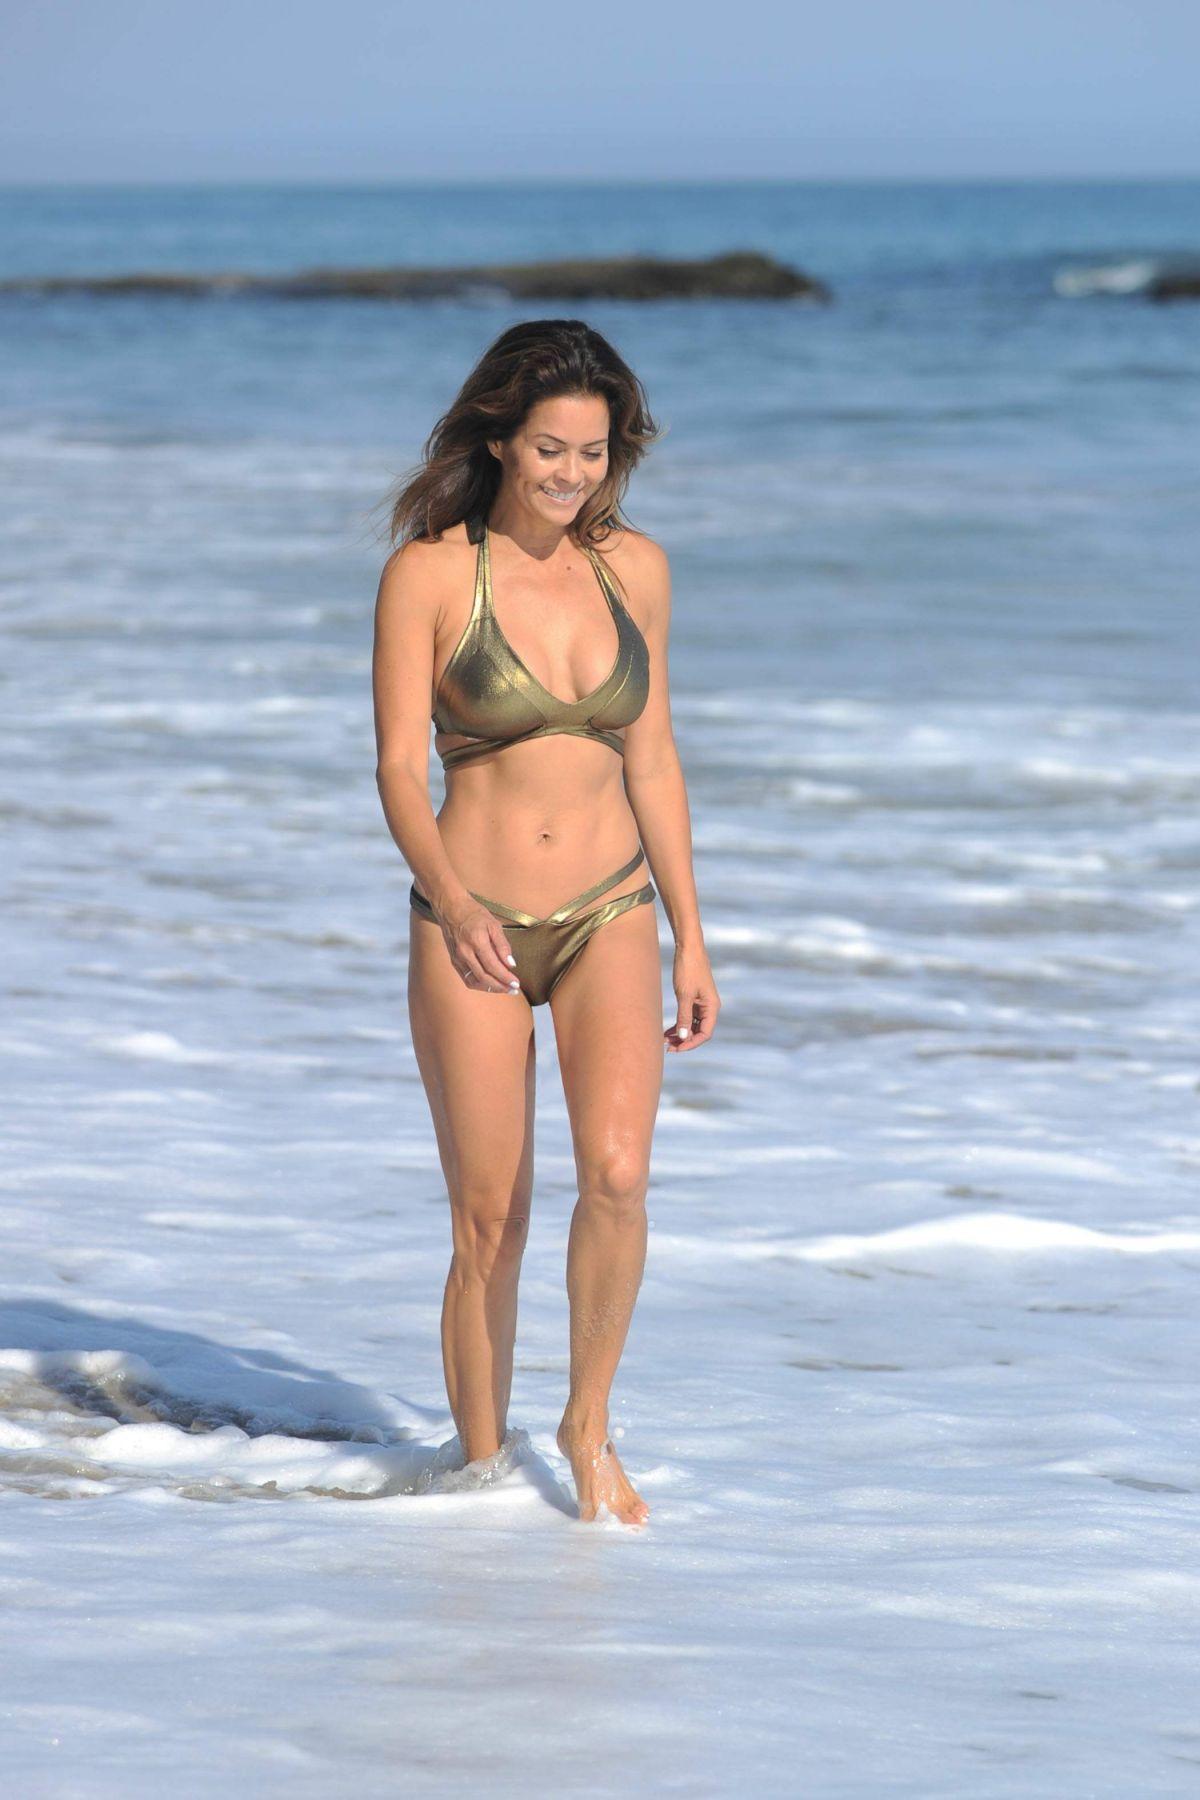 Bikini Brooke Burke naked (29 pics), Hot